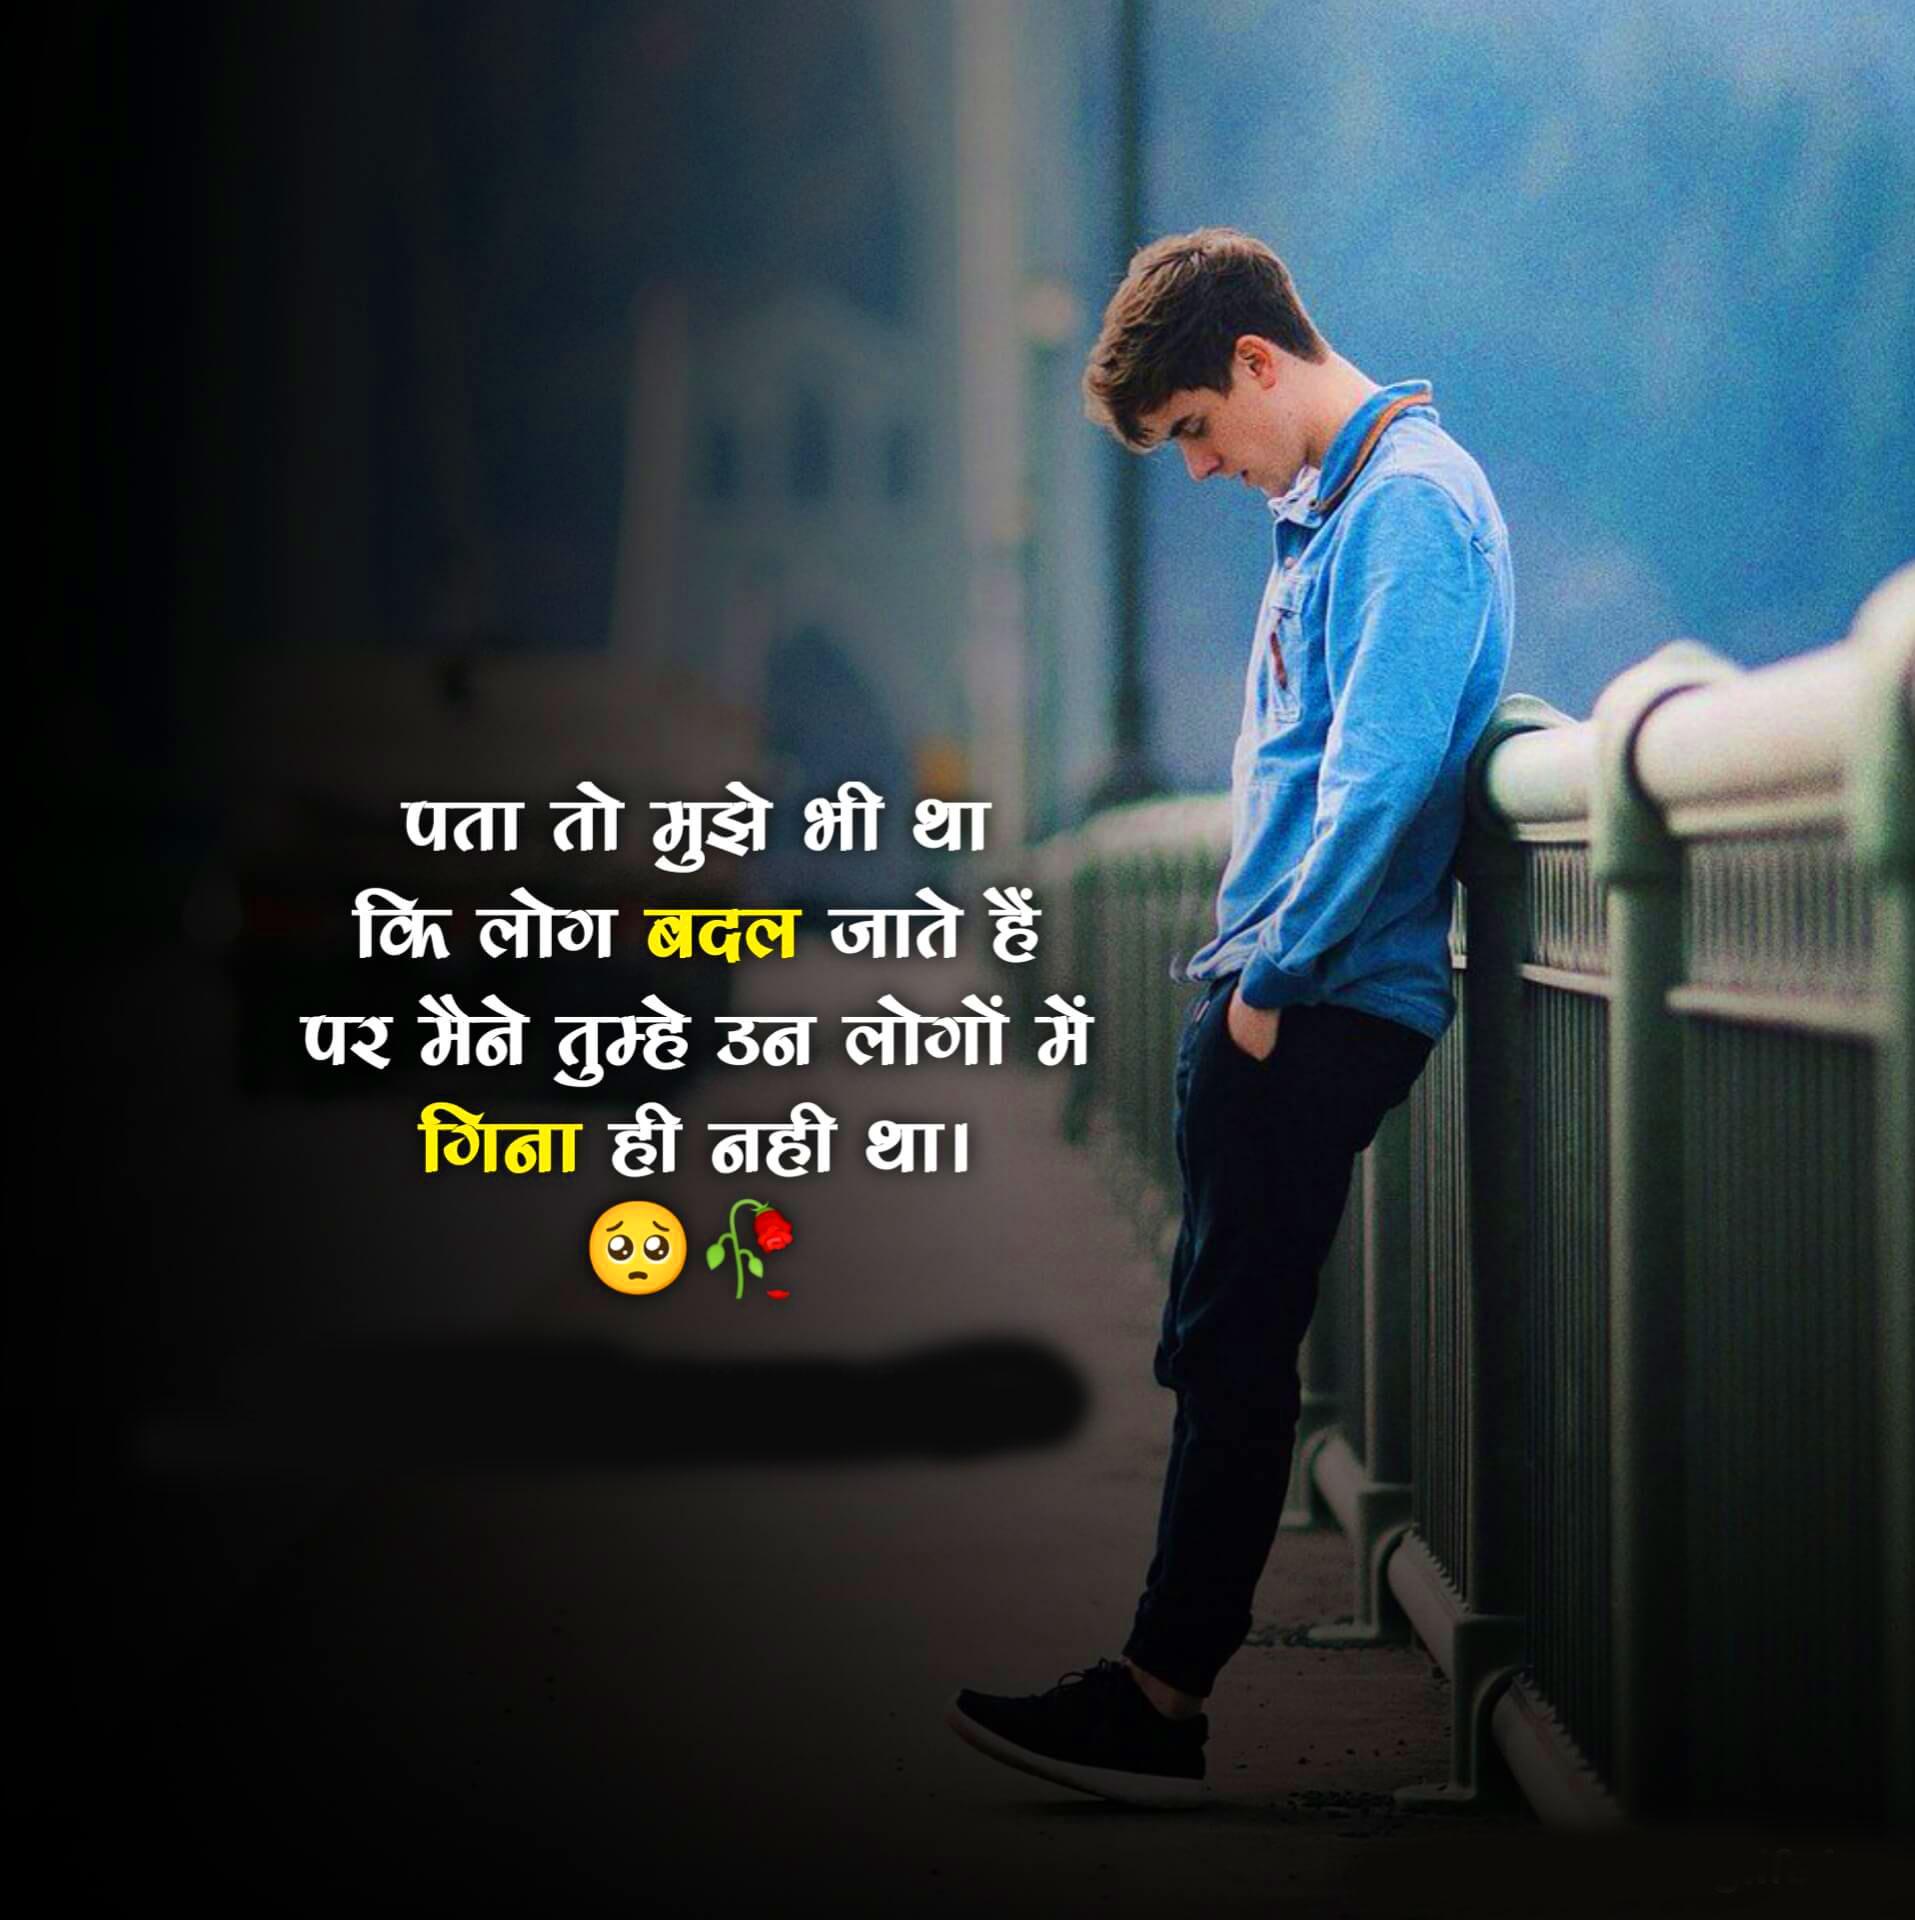 New Sad Boy Shayari Images pictures pics download